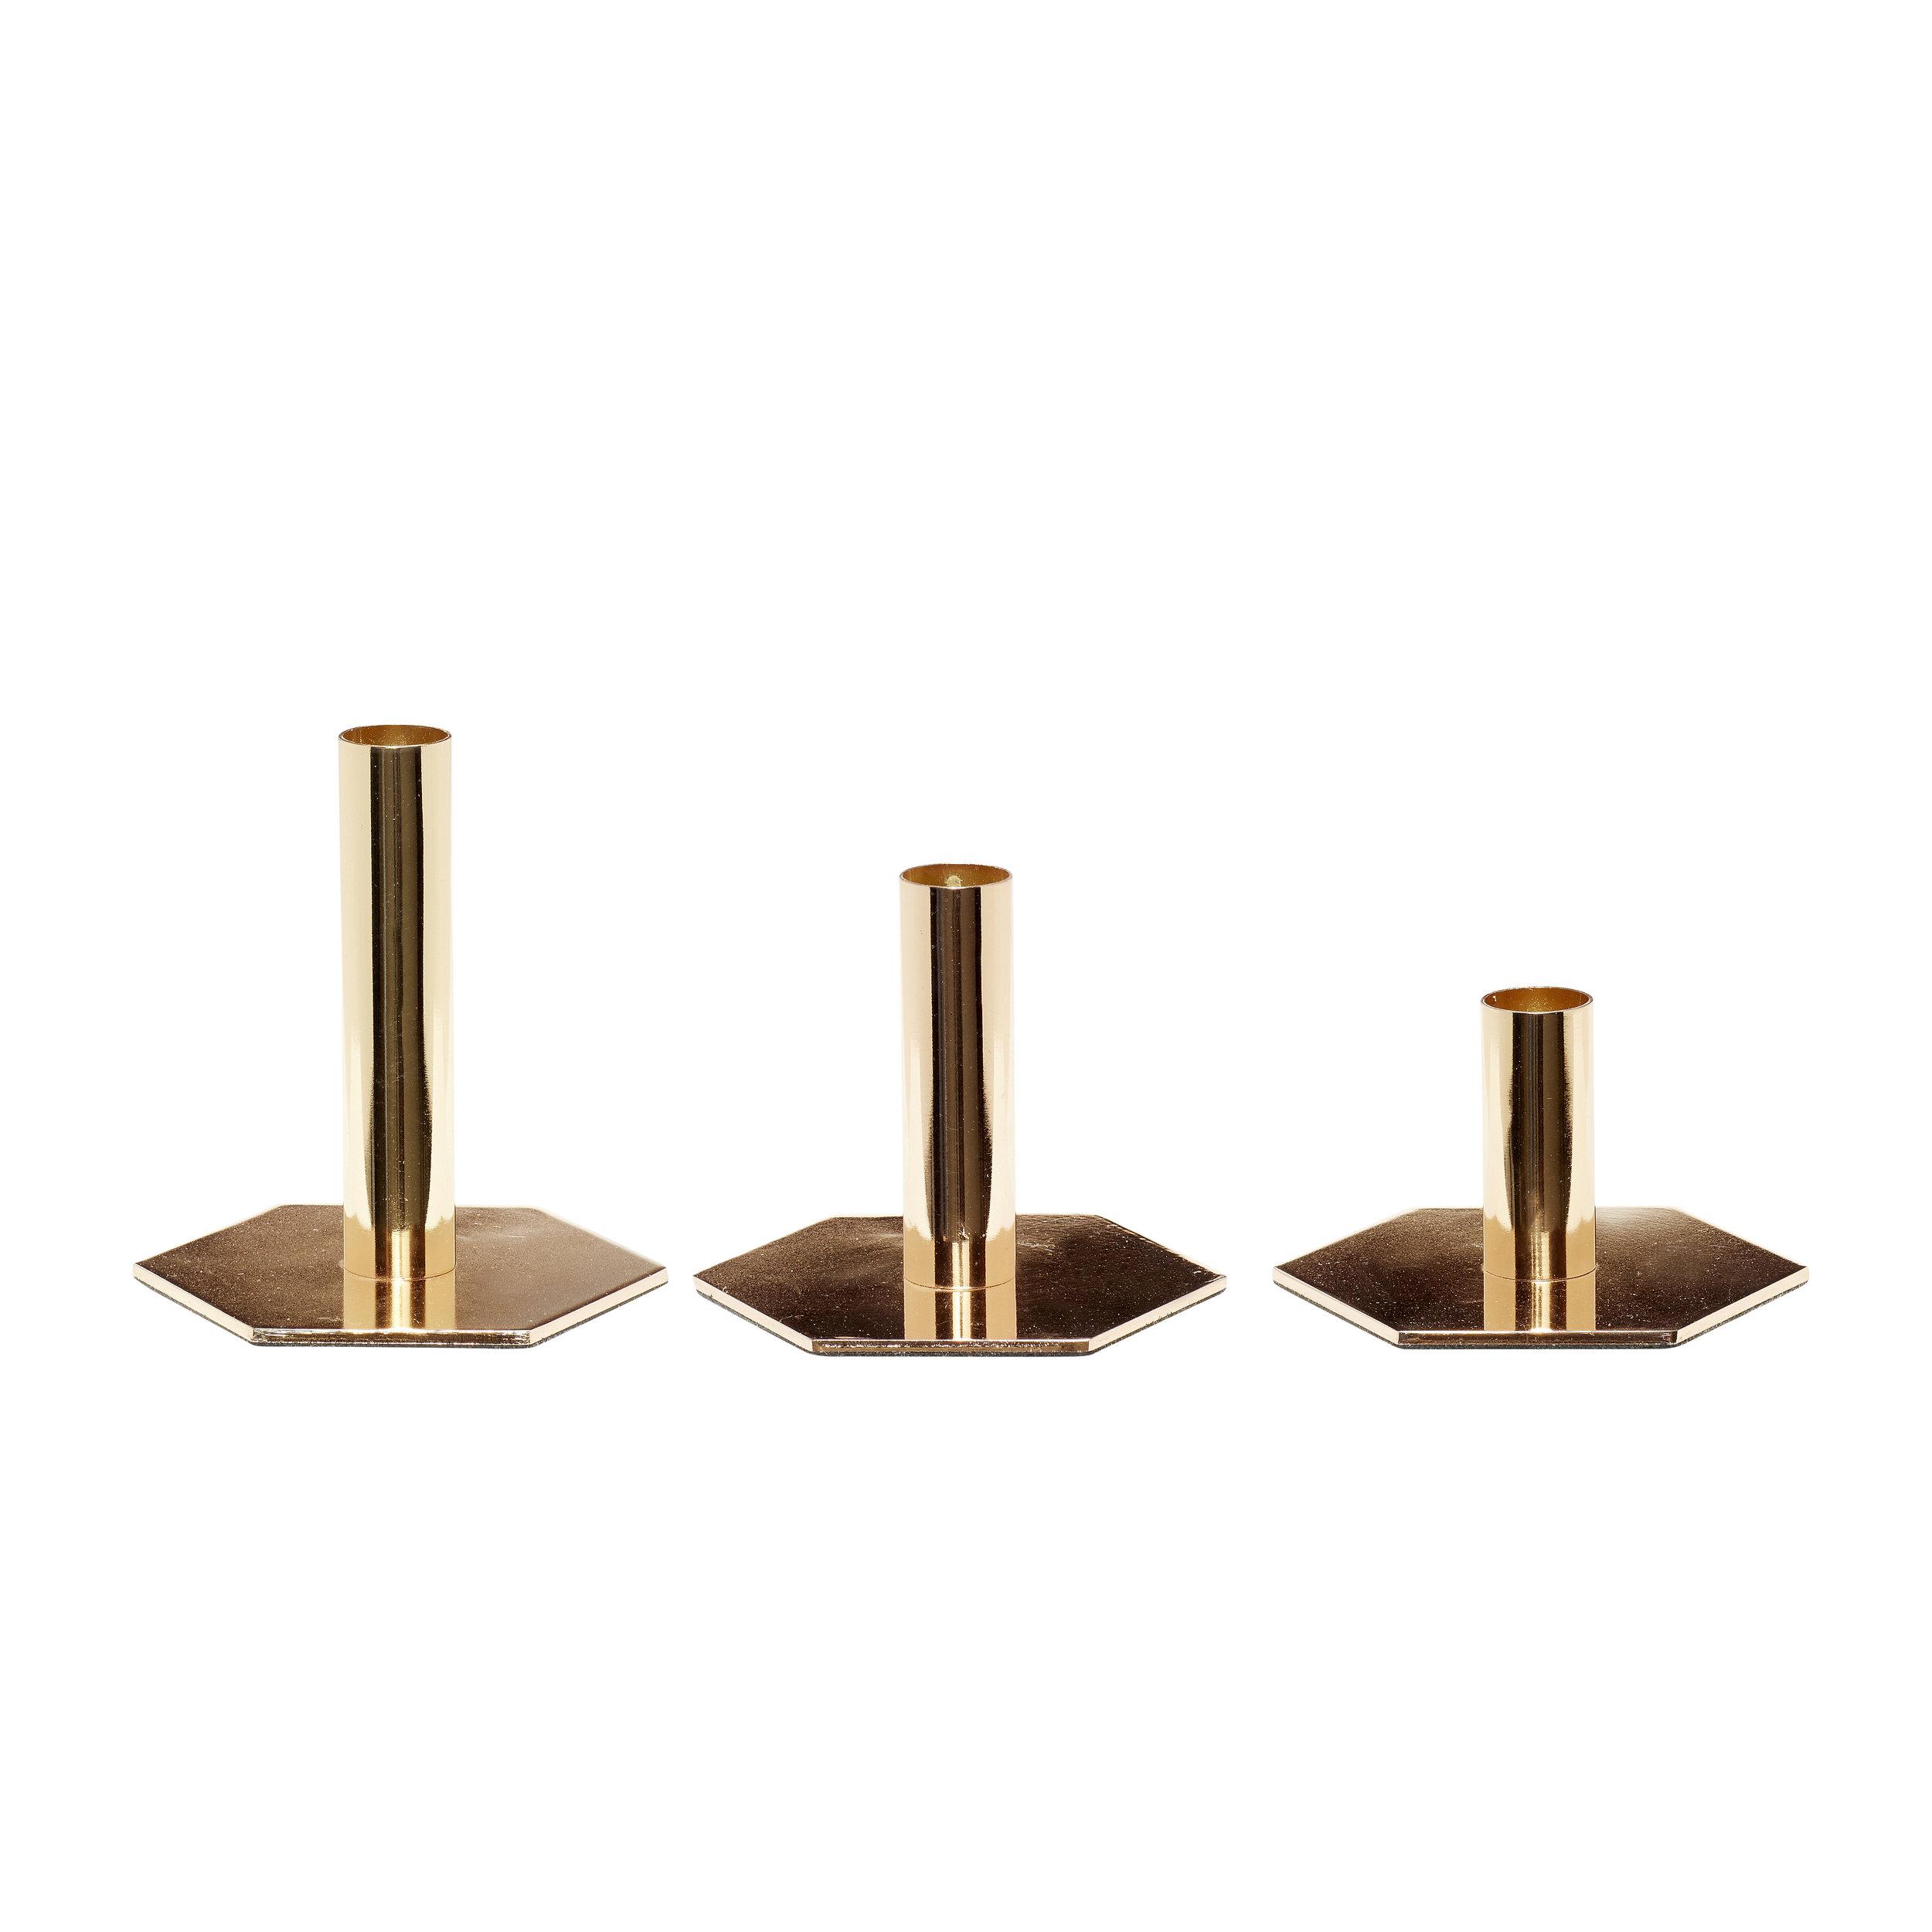 #037   Gold Candle Stick Set of 3   12xH7cm, 12xH10cm, 12xH13cm Hire Price per set - £6 Minimum Order 2 per set Current Stock Available 4 per set